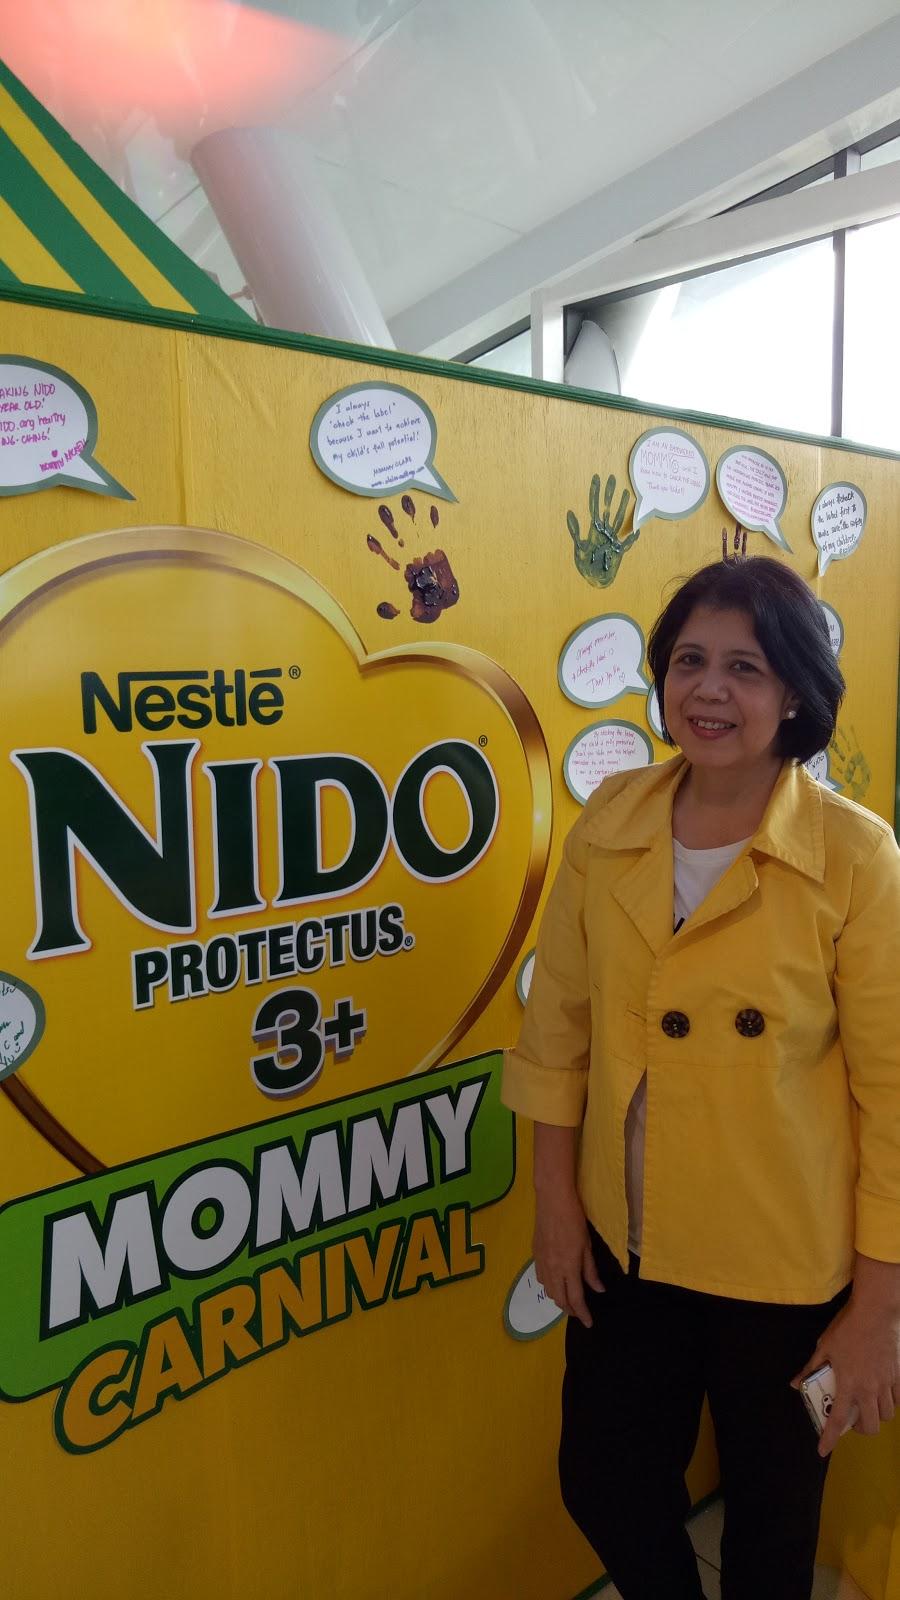 meet the new nido protectus